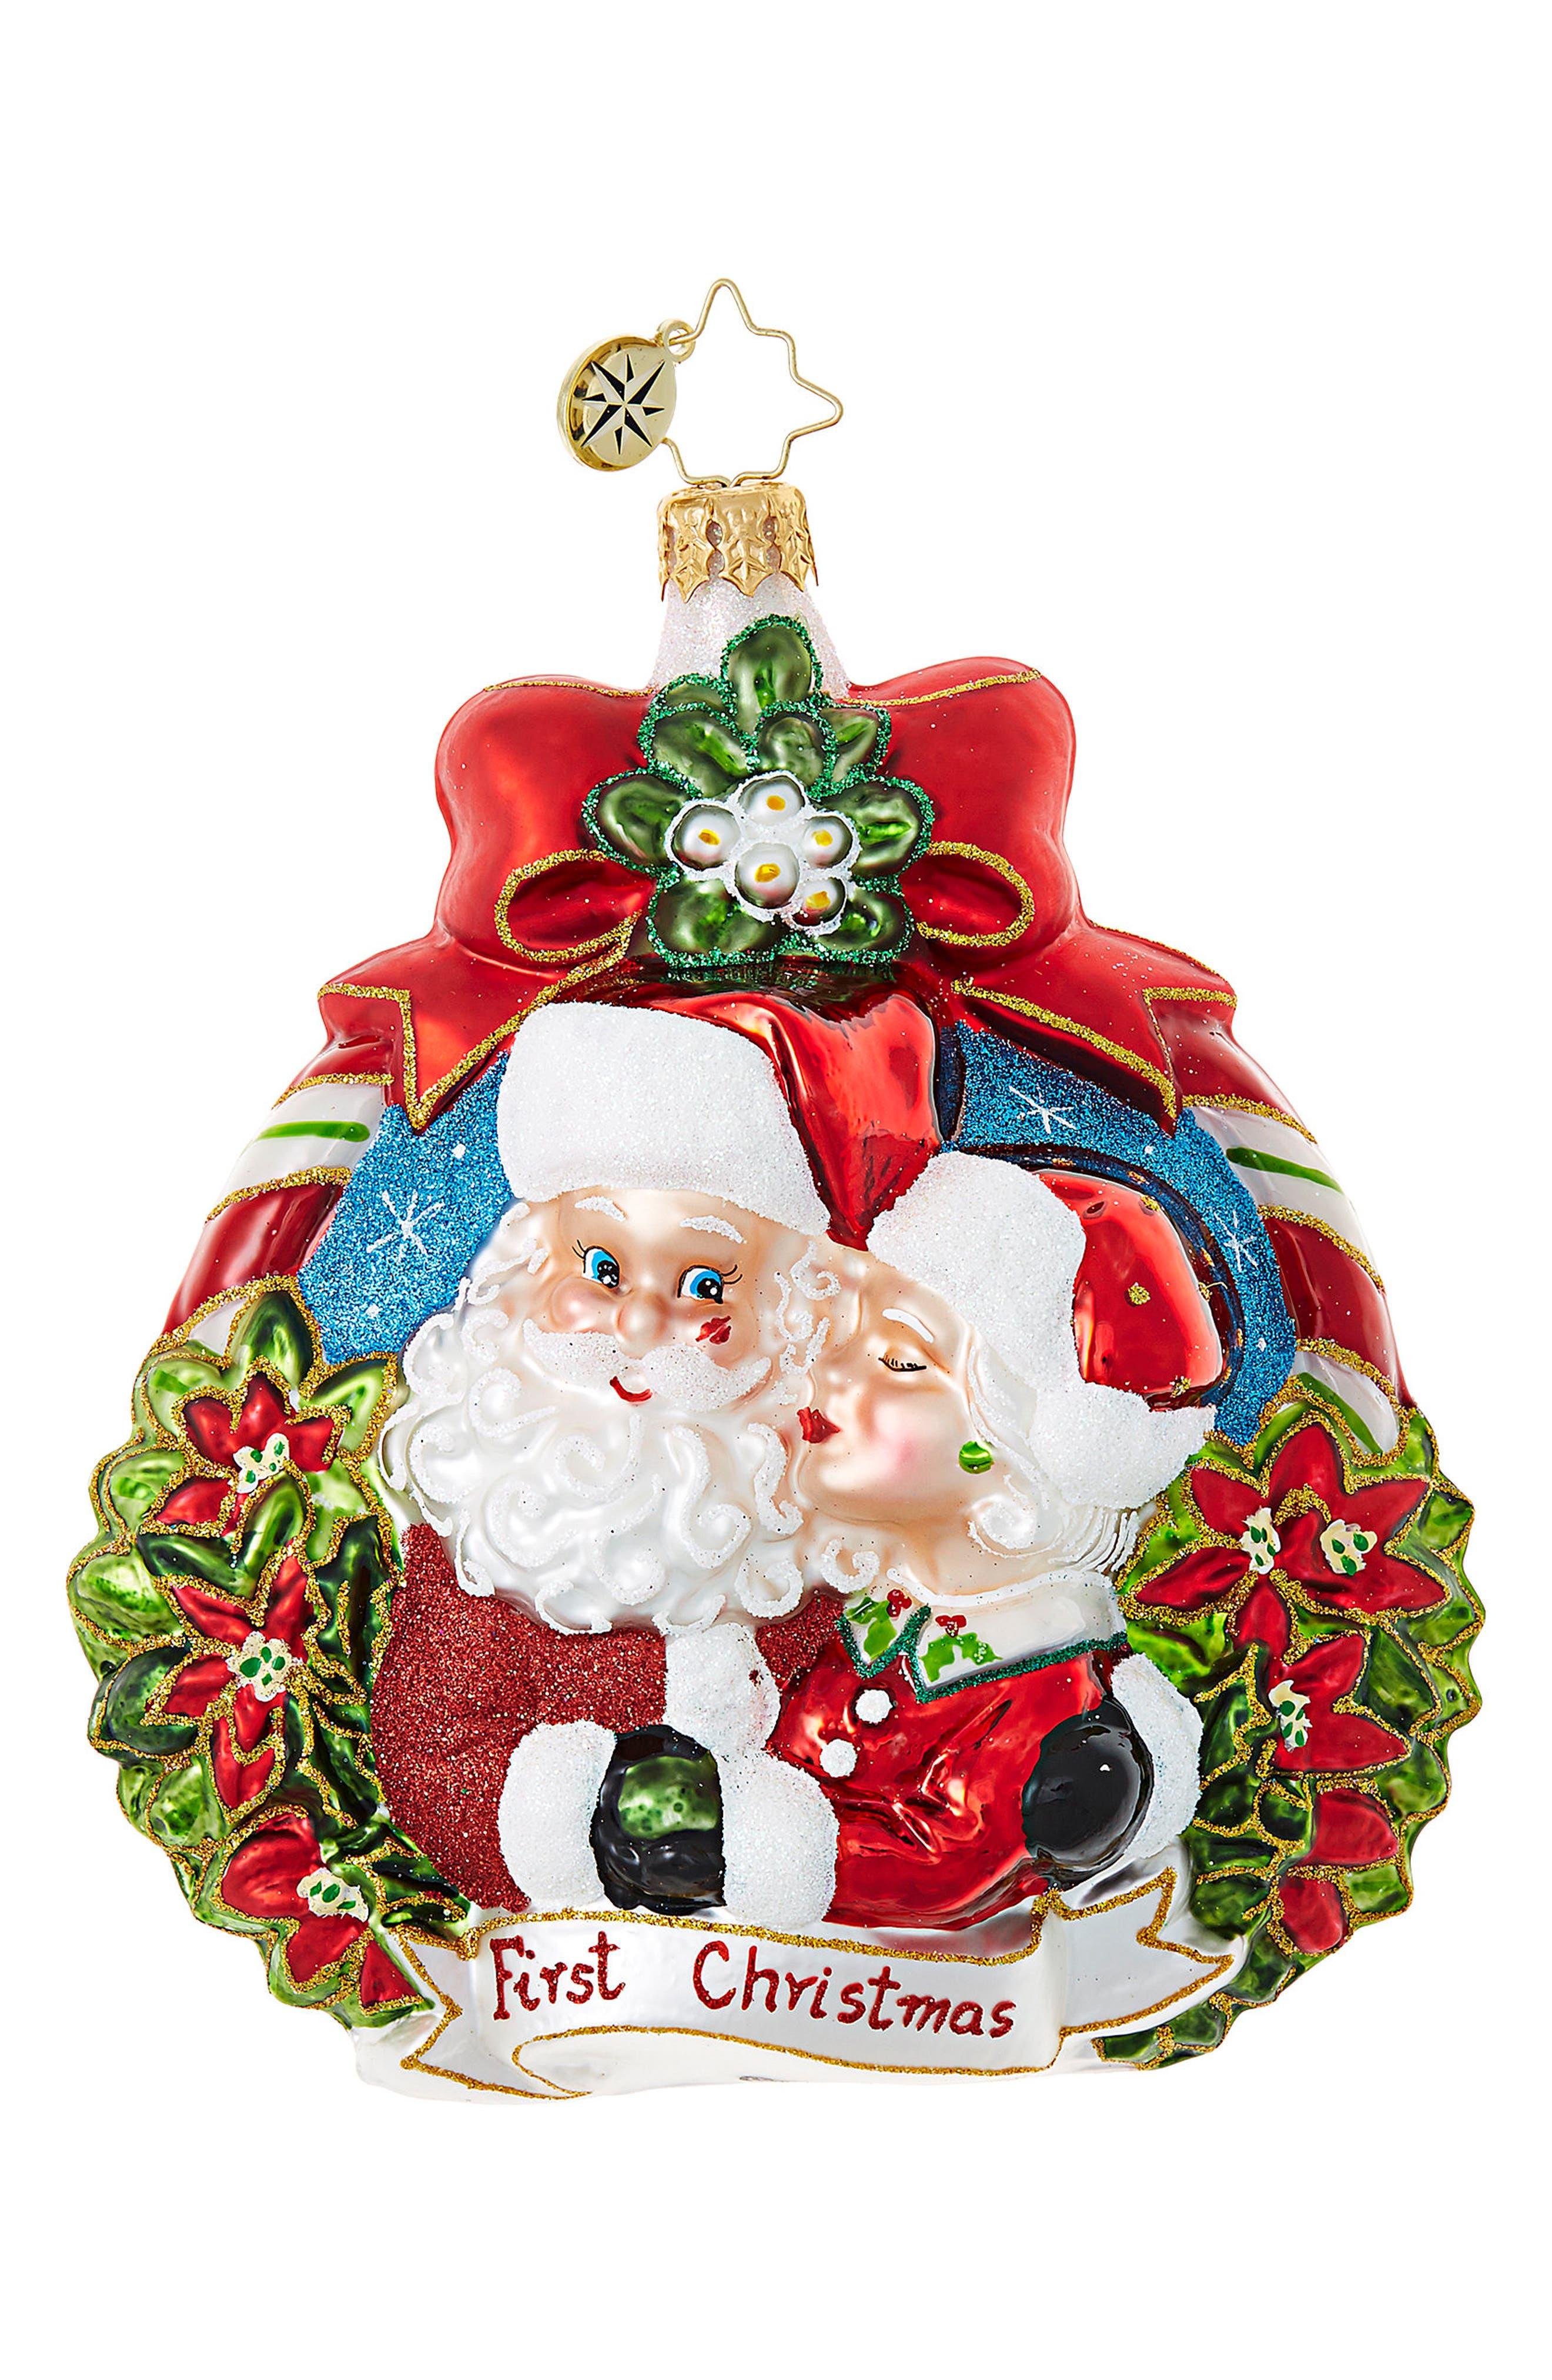 Alternate Image 1 Selected - Christopher Radko First Christmas Glass Ornament